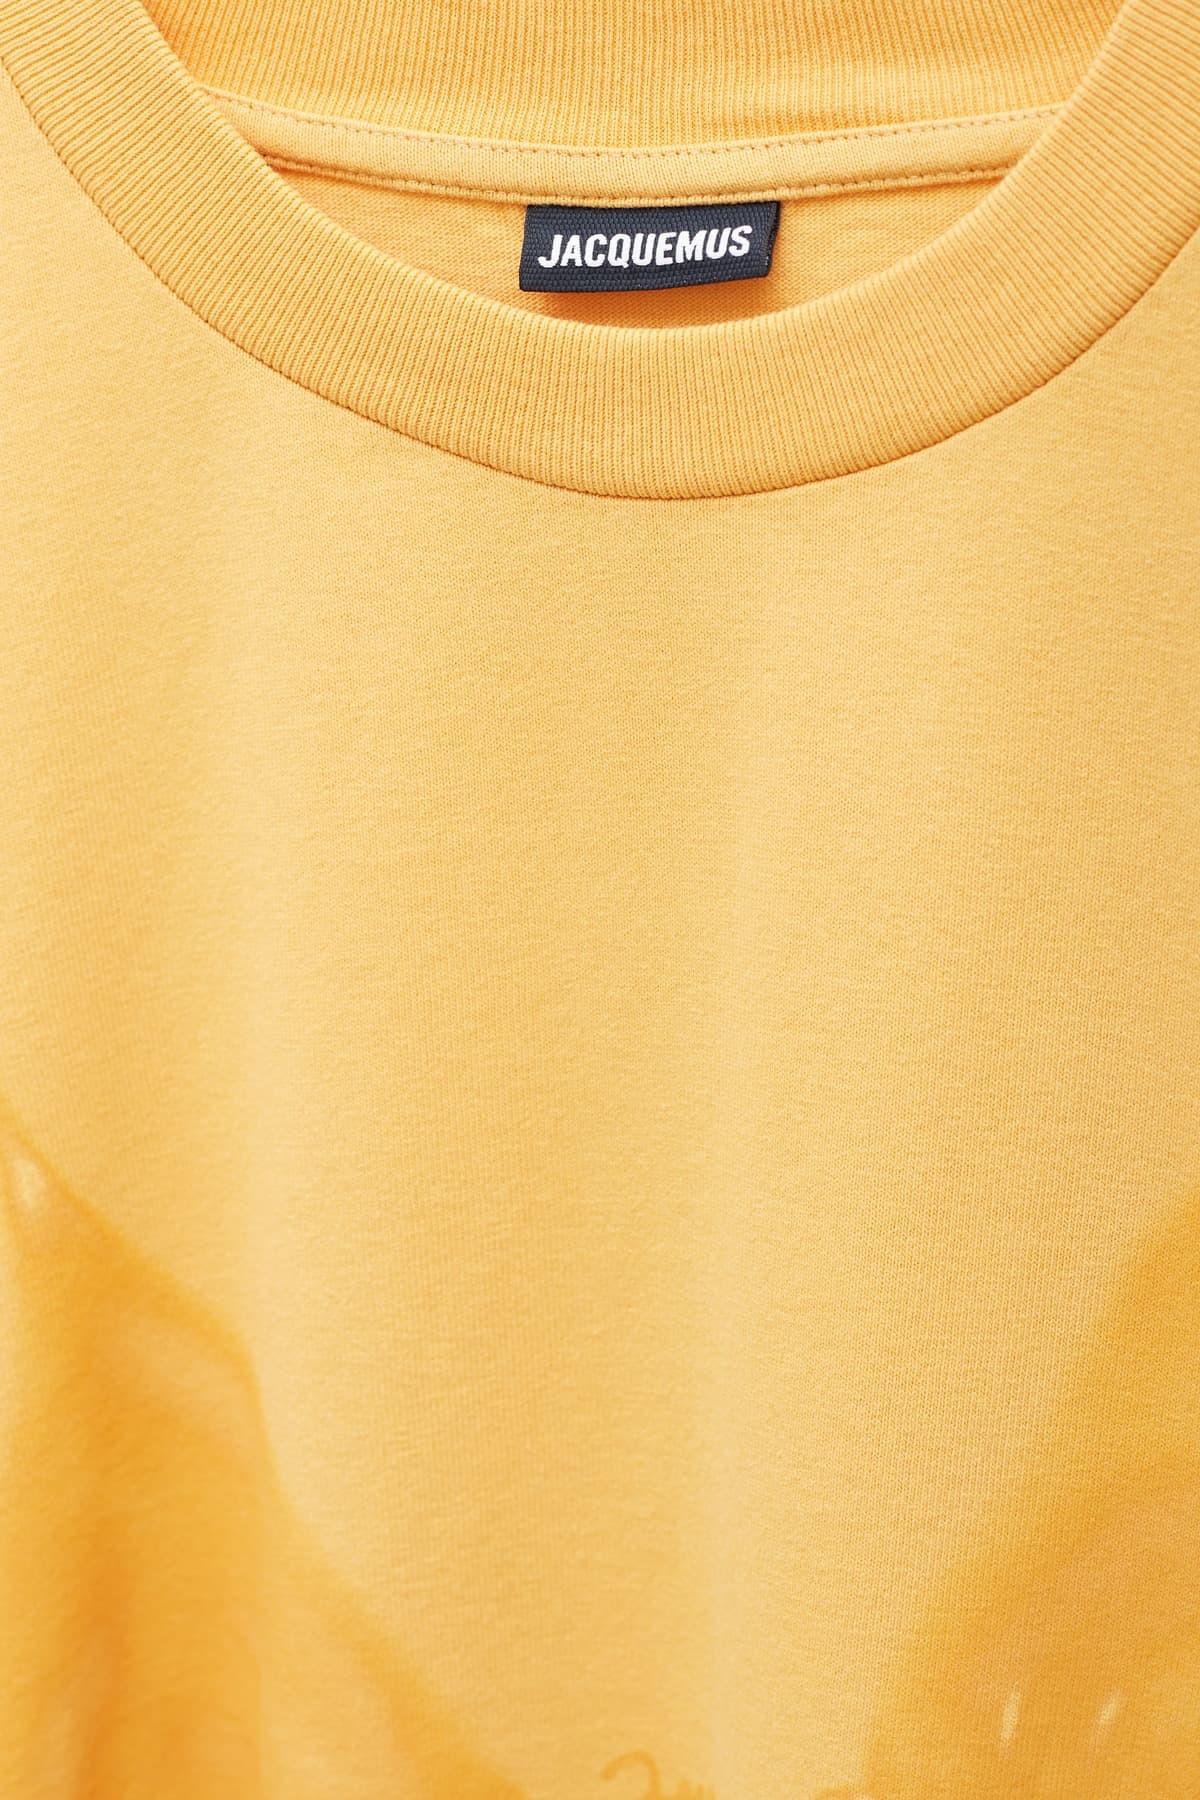 Shop Converse Black High Chuck 70 Sneakers 162050CC